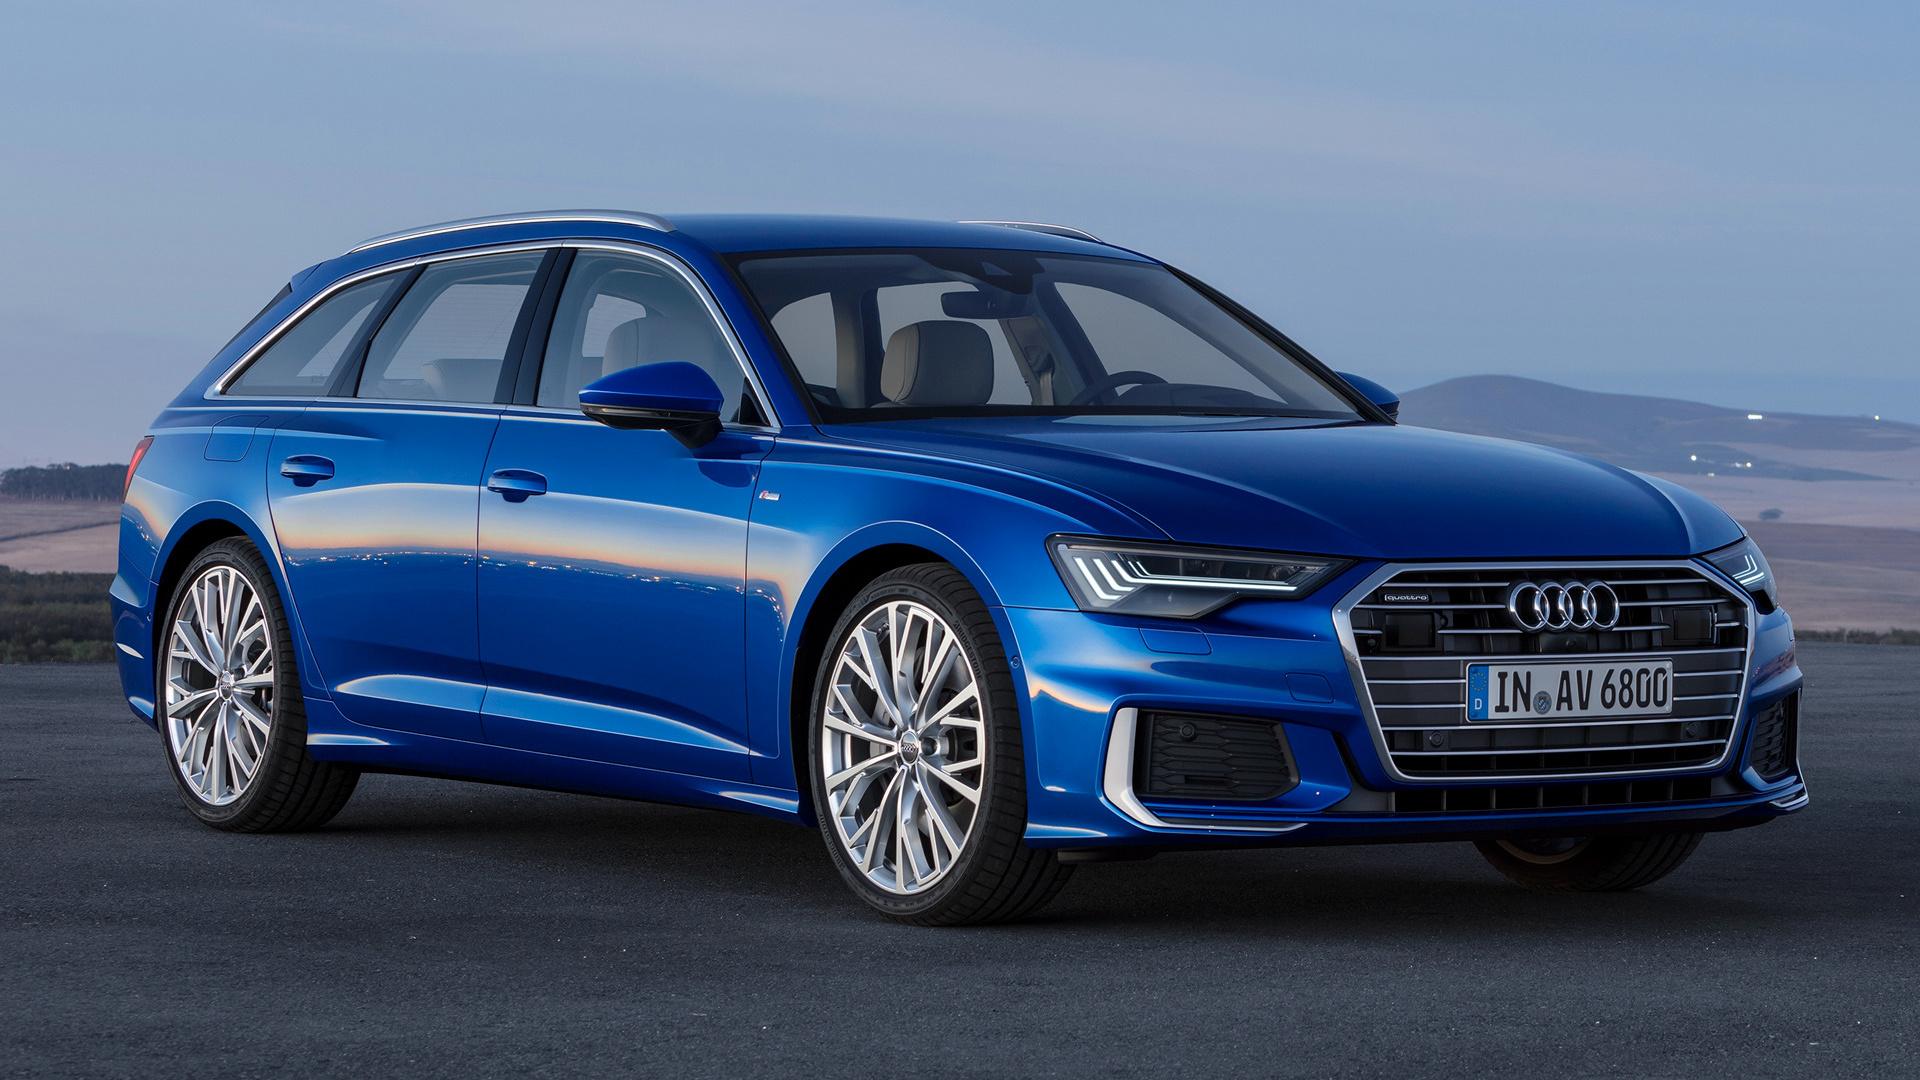 2018 Audi A6 Avant S Line Hd Wallpaper Background Image